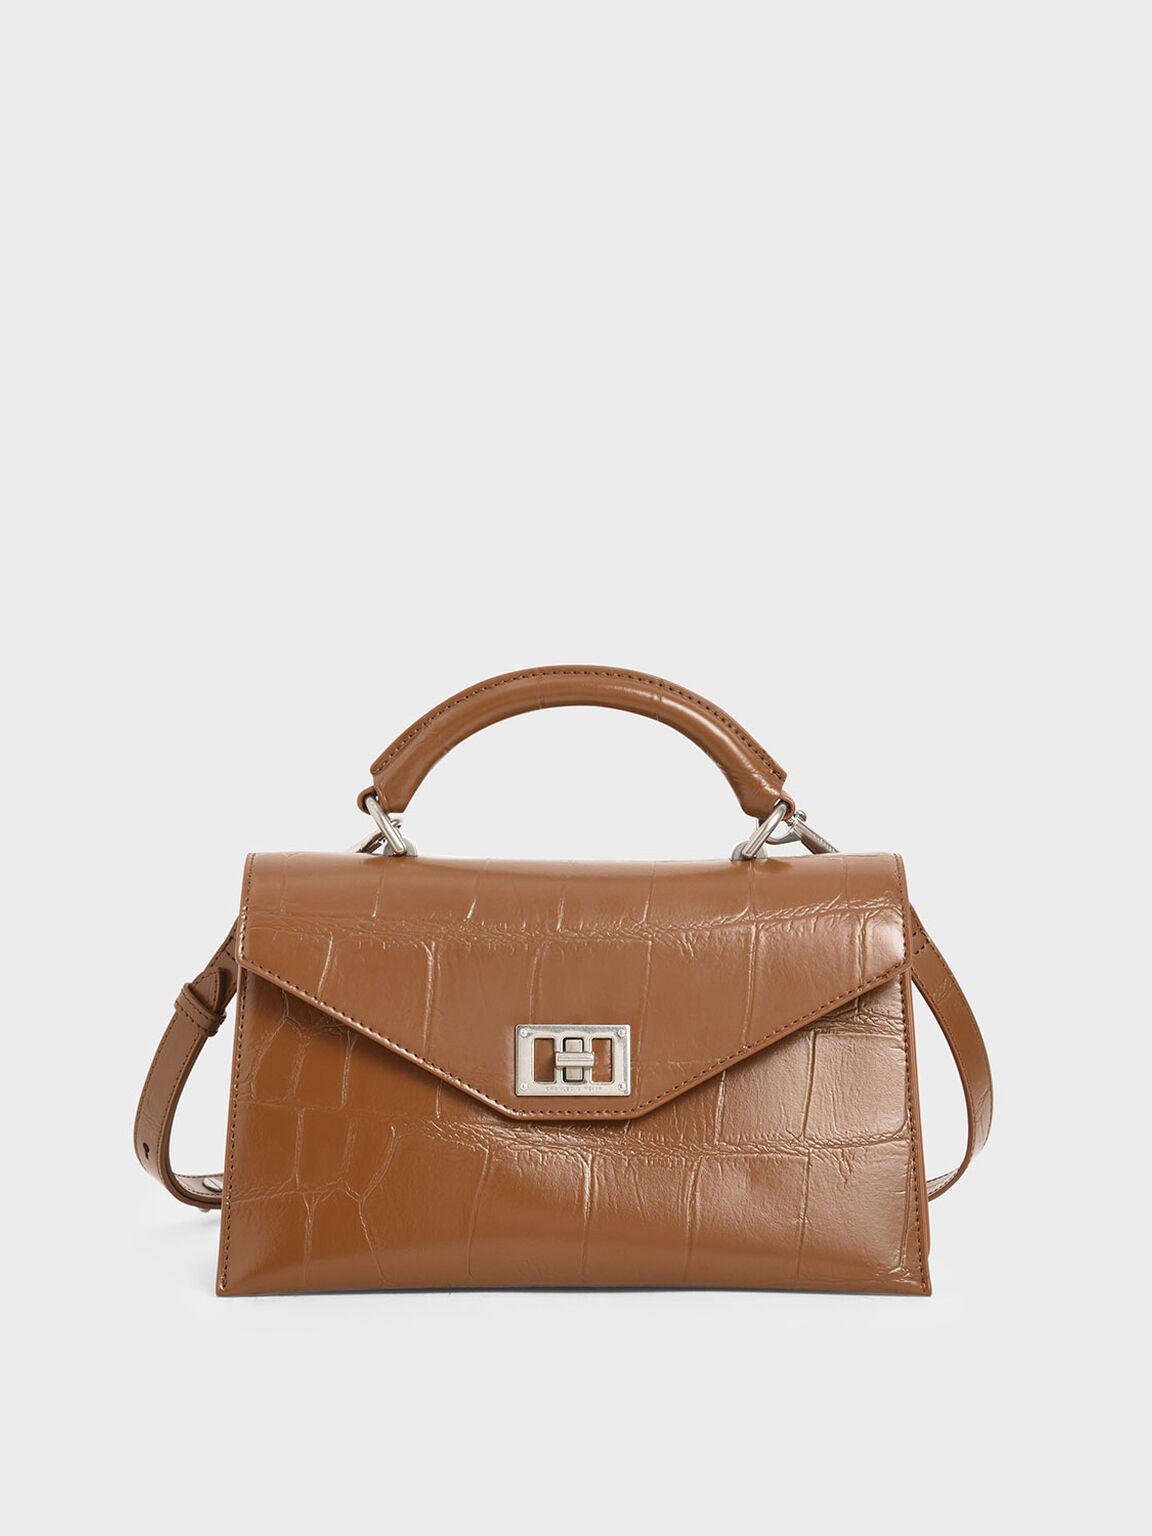 Croc-Effect Turn-Lock Top Handle Bag, Cognac, hi-res